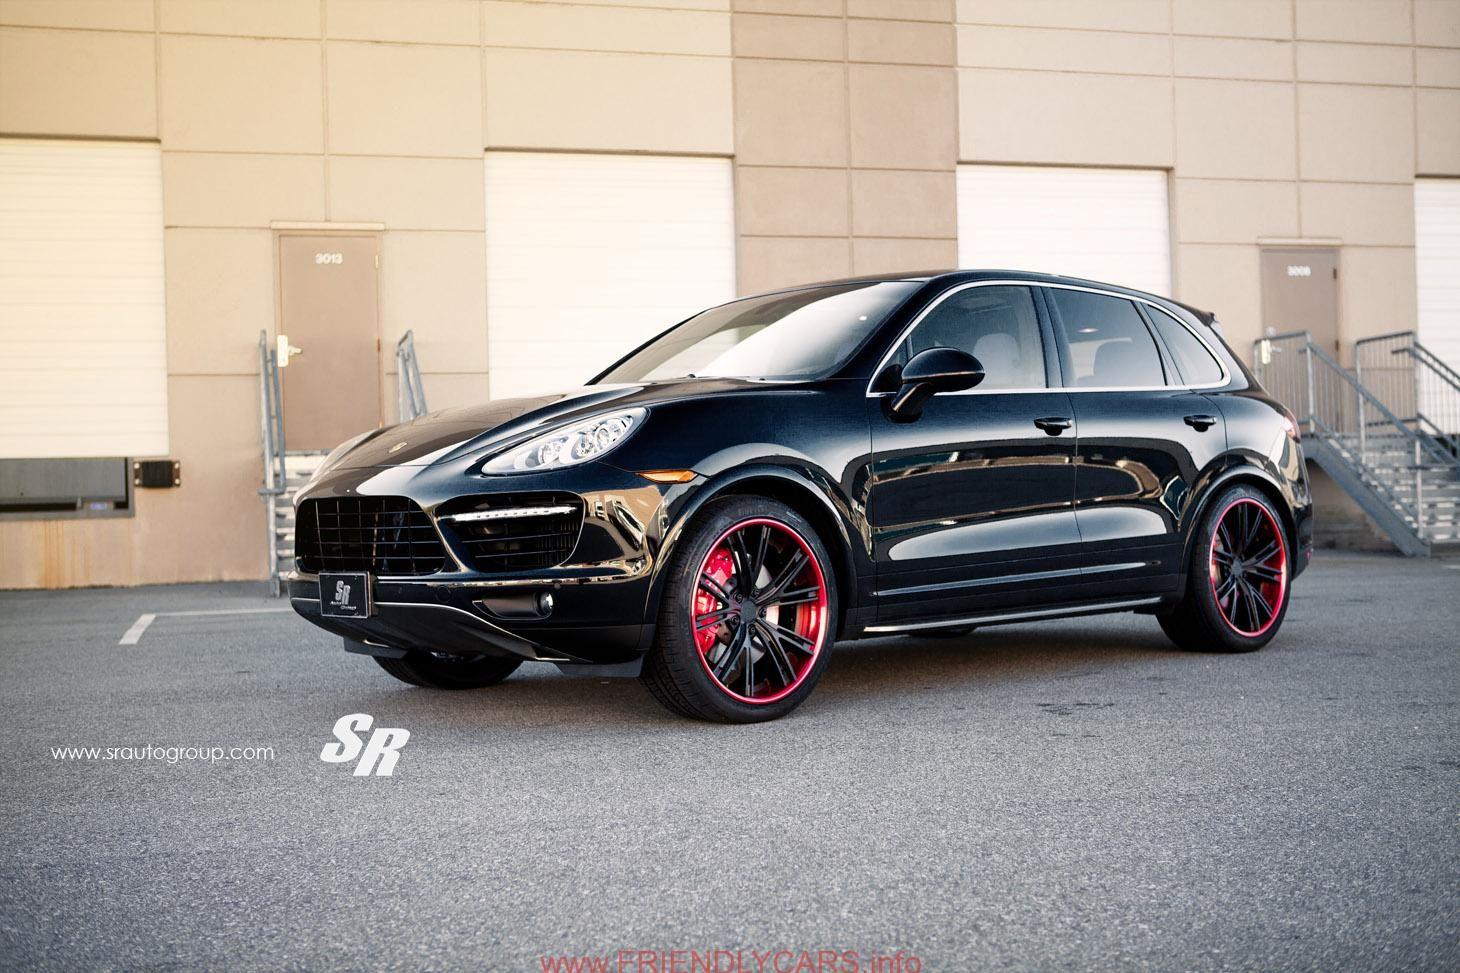 Nice porsche cayenne turbo 2014 black car images hd sr auto porsche cayenne turbo s with